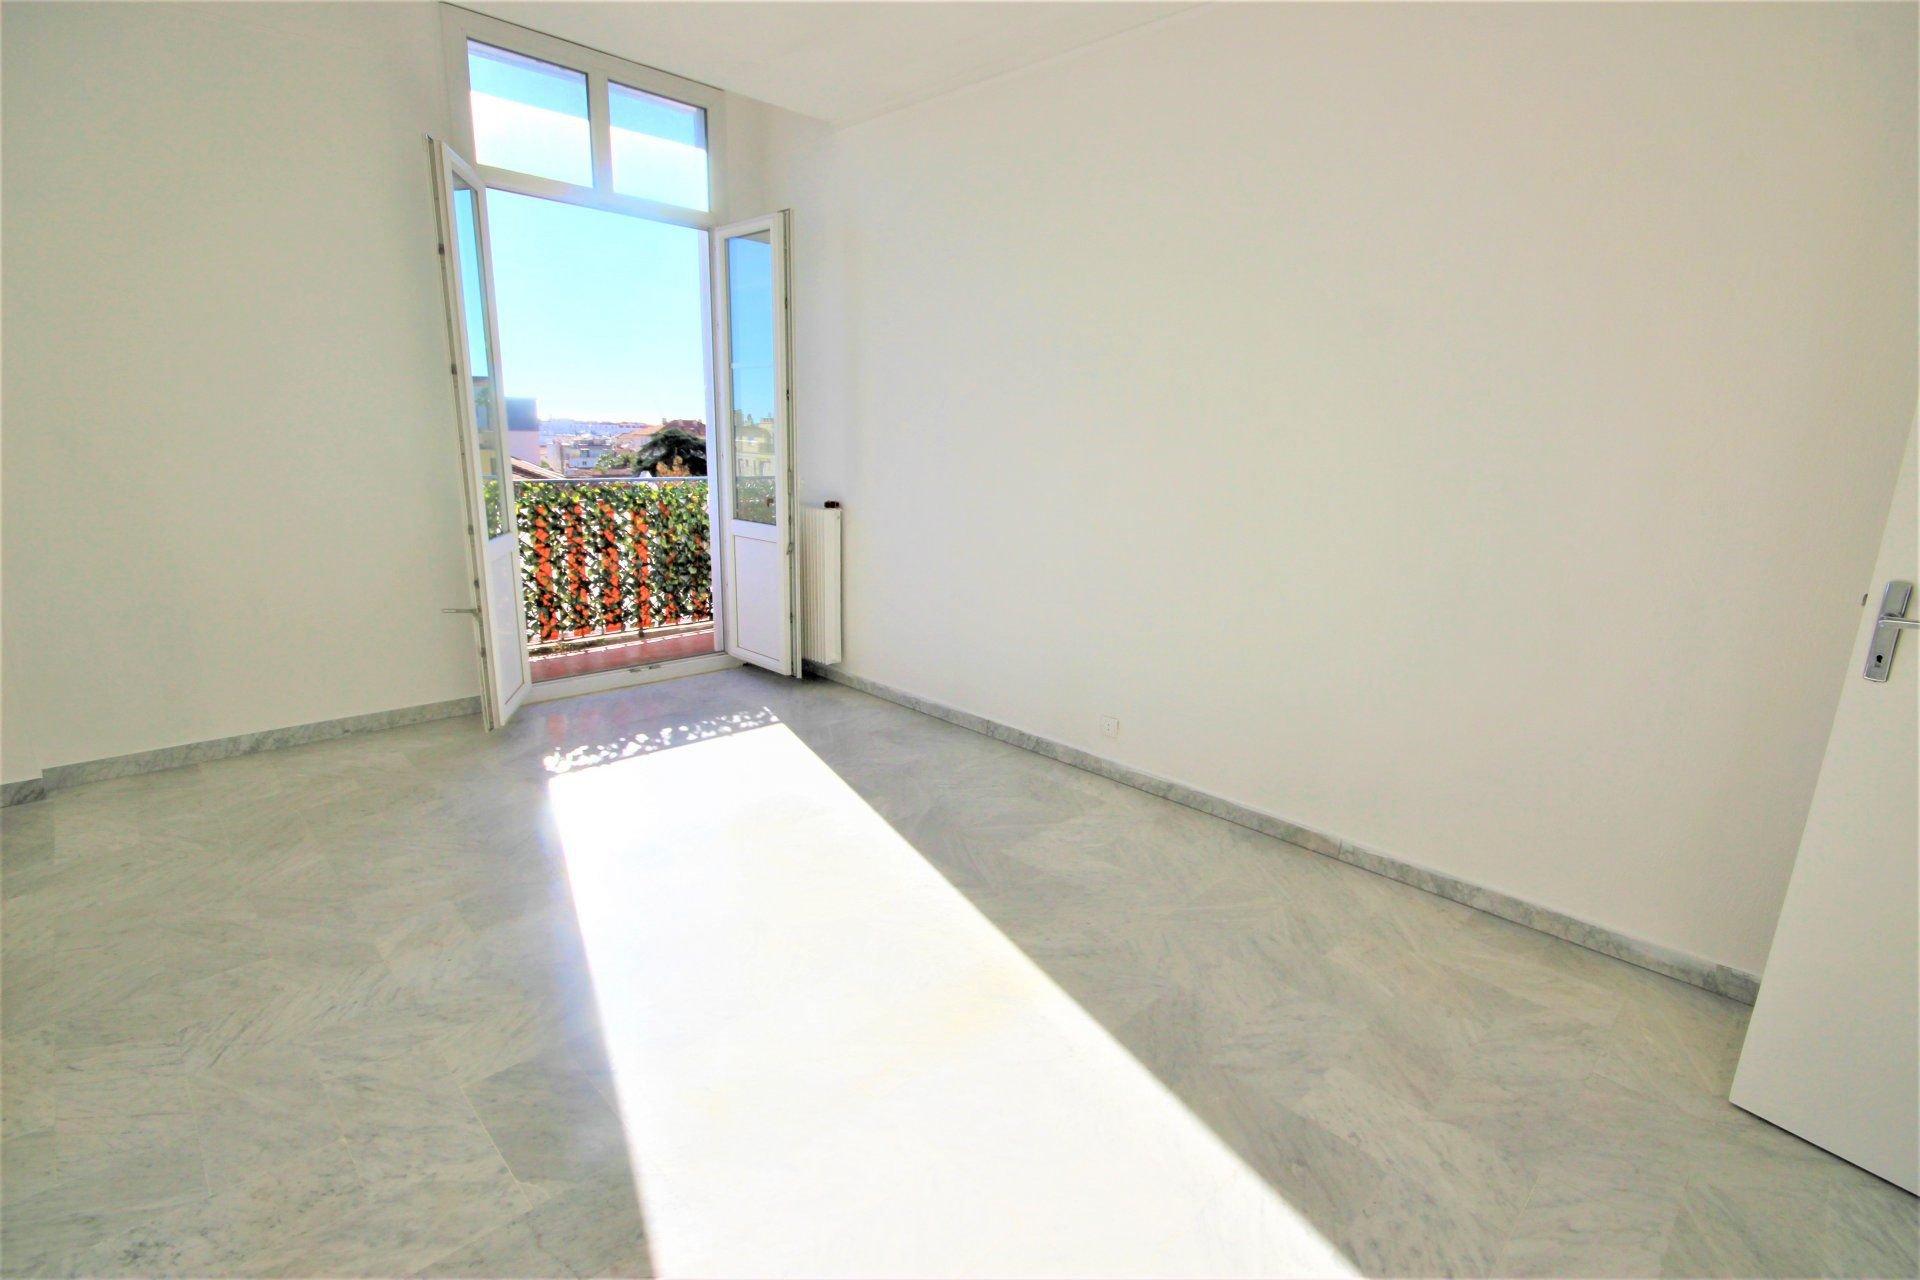 [Appartement]Floor 5th, View Dégagée Aperçu mer, Position south, General condition To refurbish, Kitchen ...